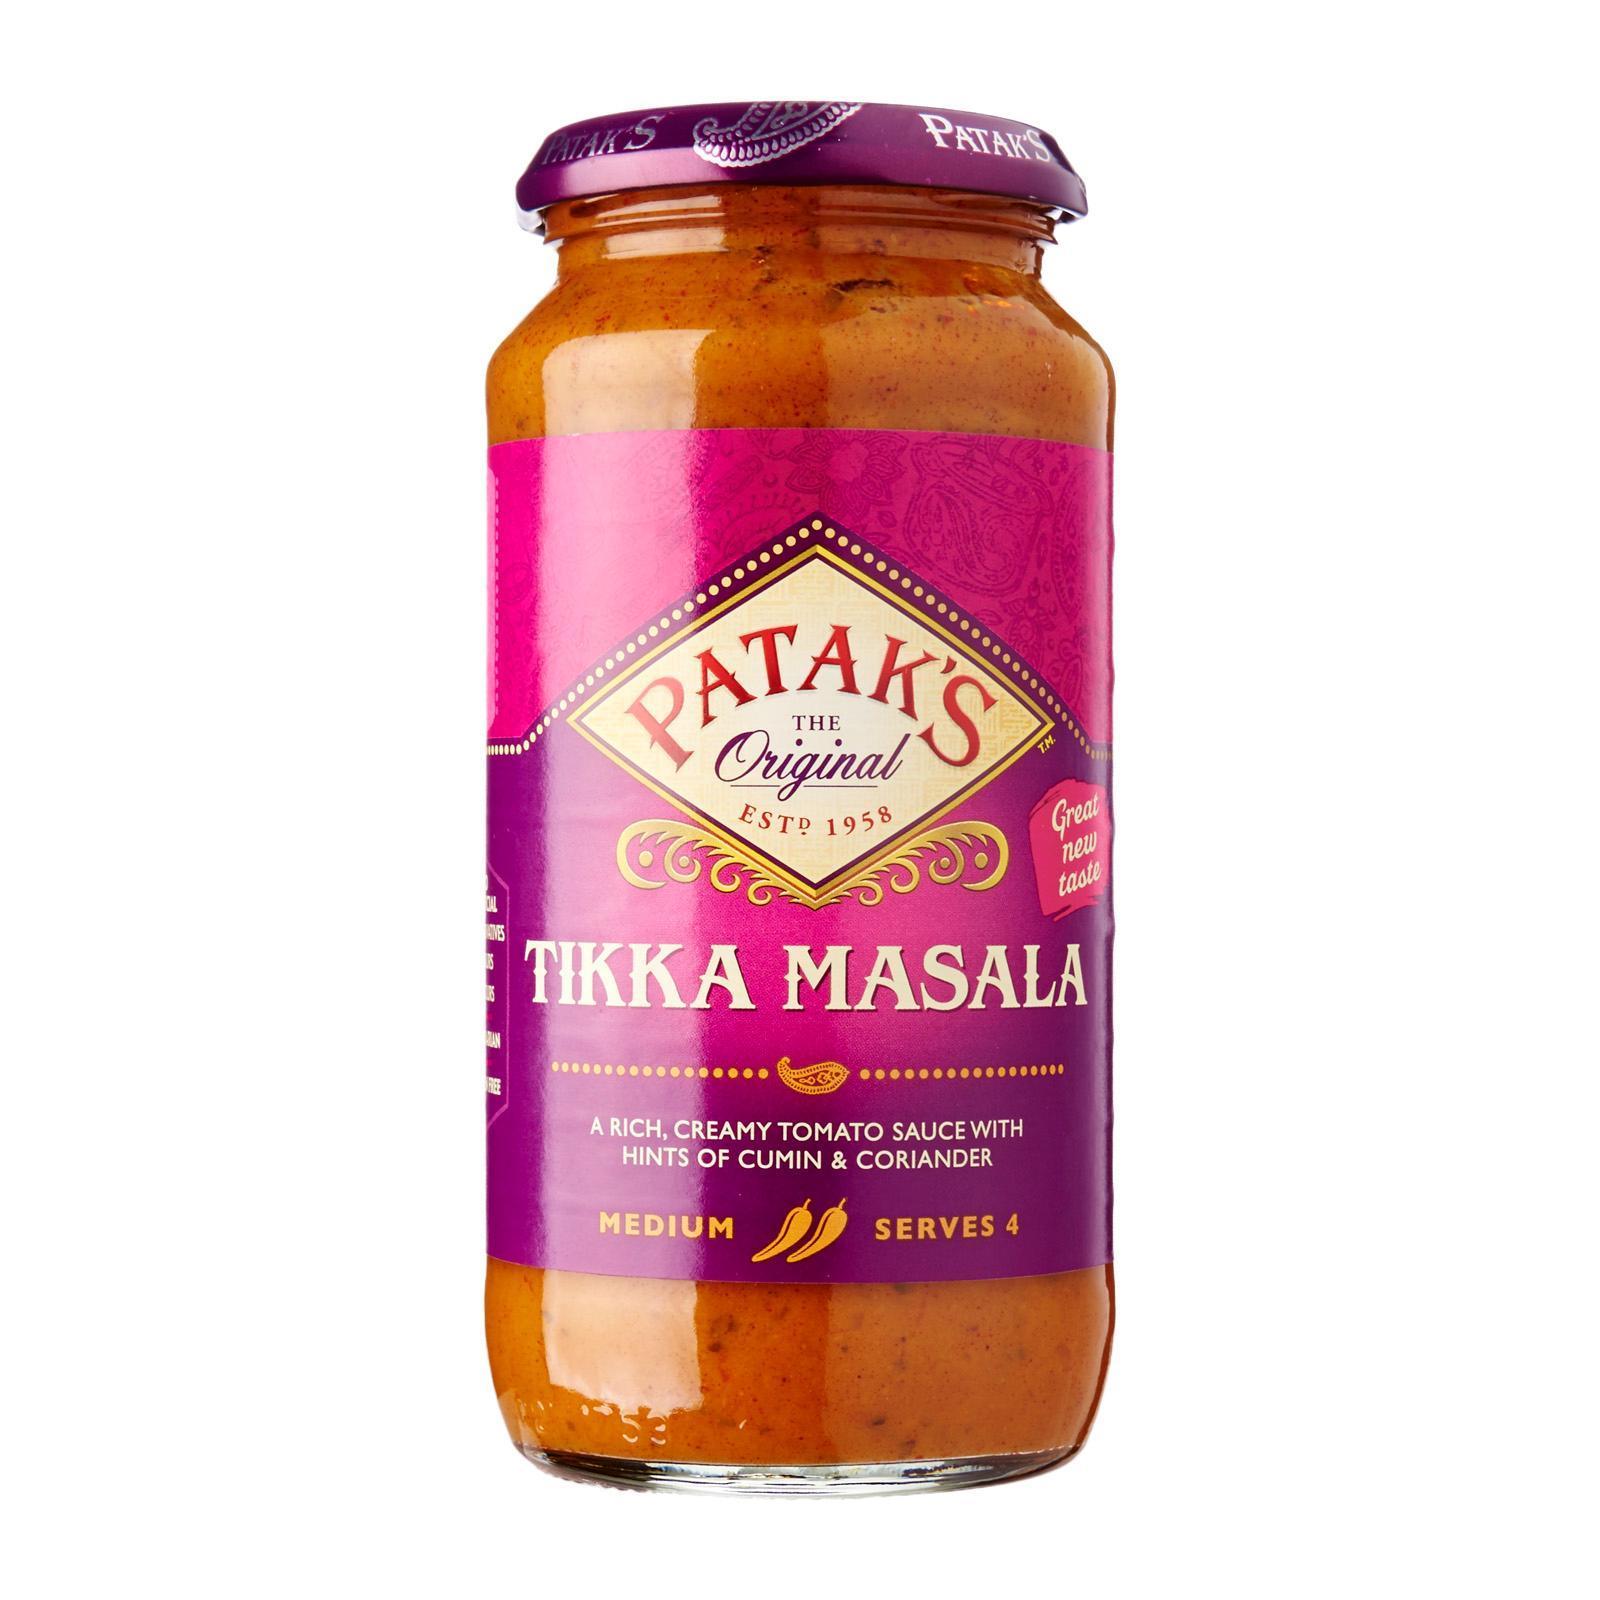 Patak's Original Tikka Masala Sauce Medium